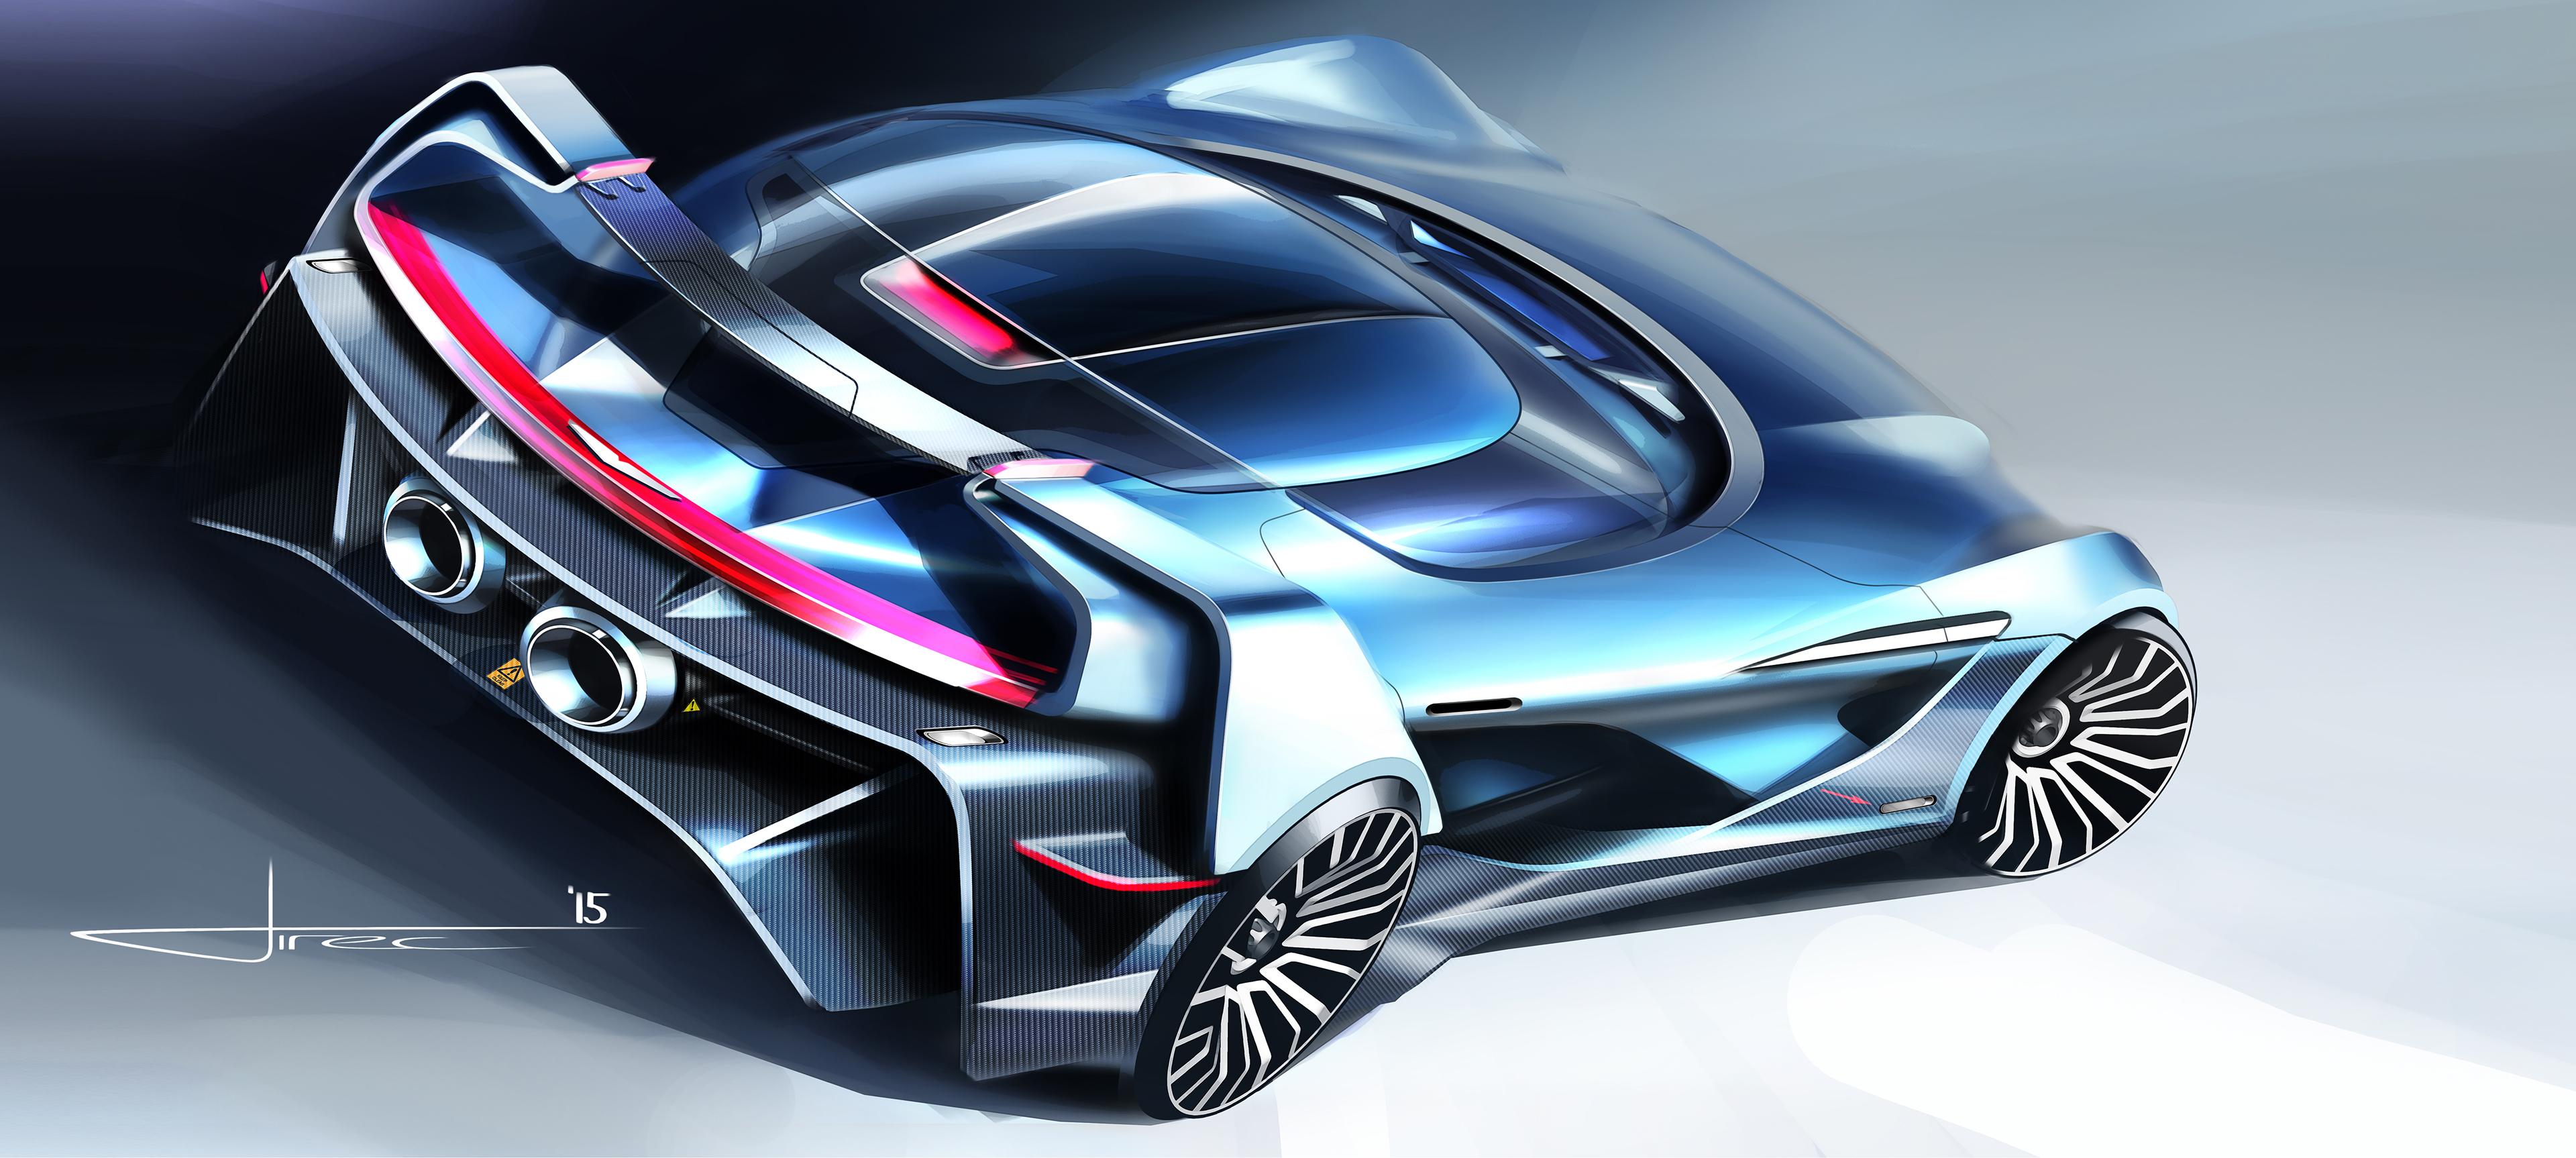 Aston Martin Tech 07 Sketches On Behance